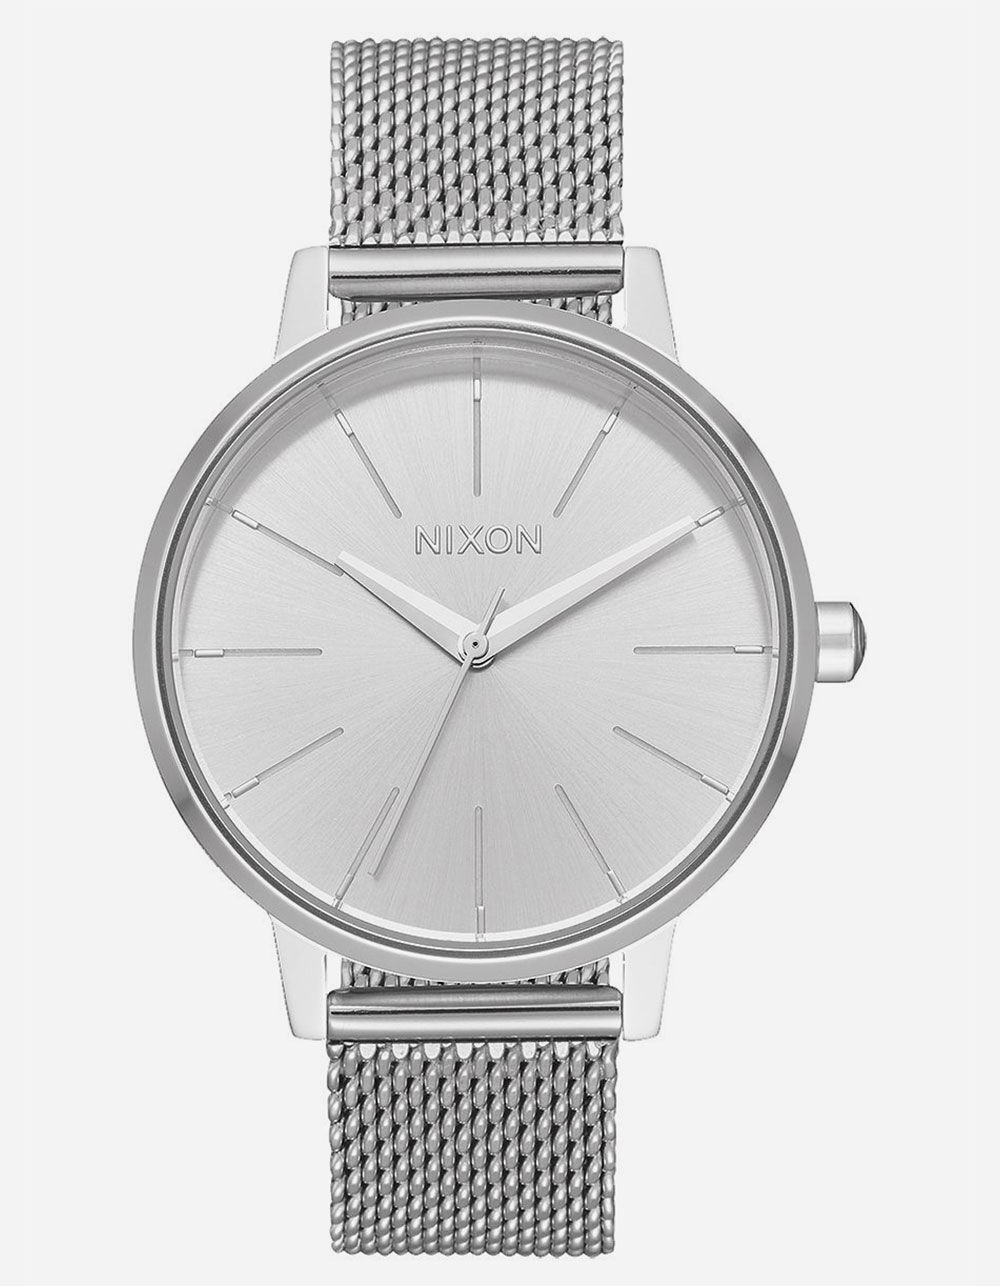 NIXON Kensington Milanese Silver Watch